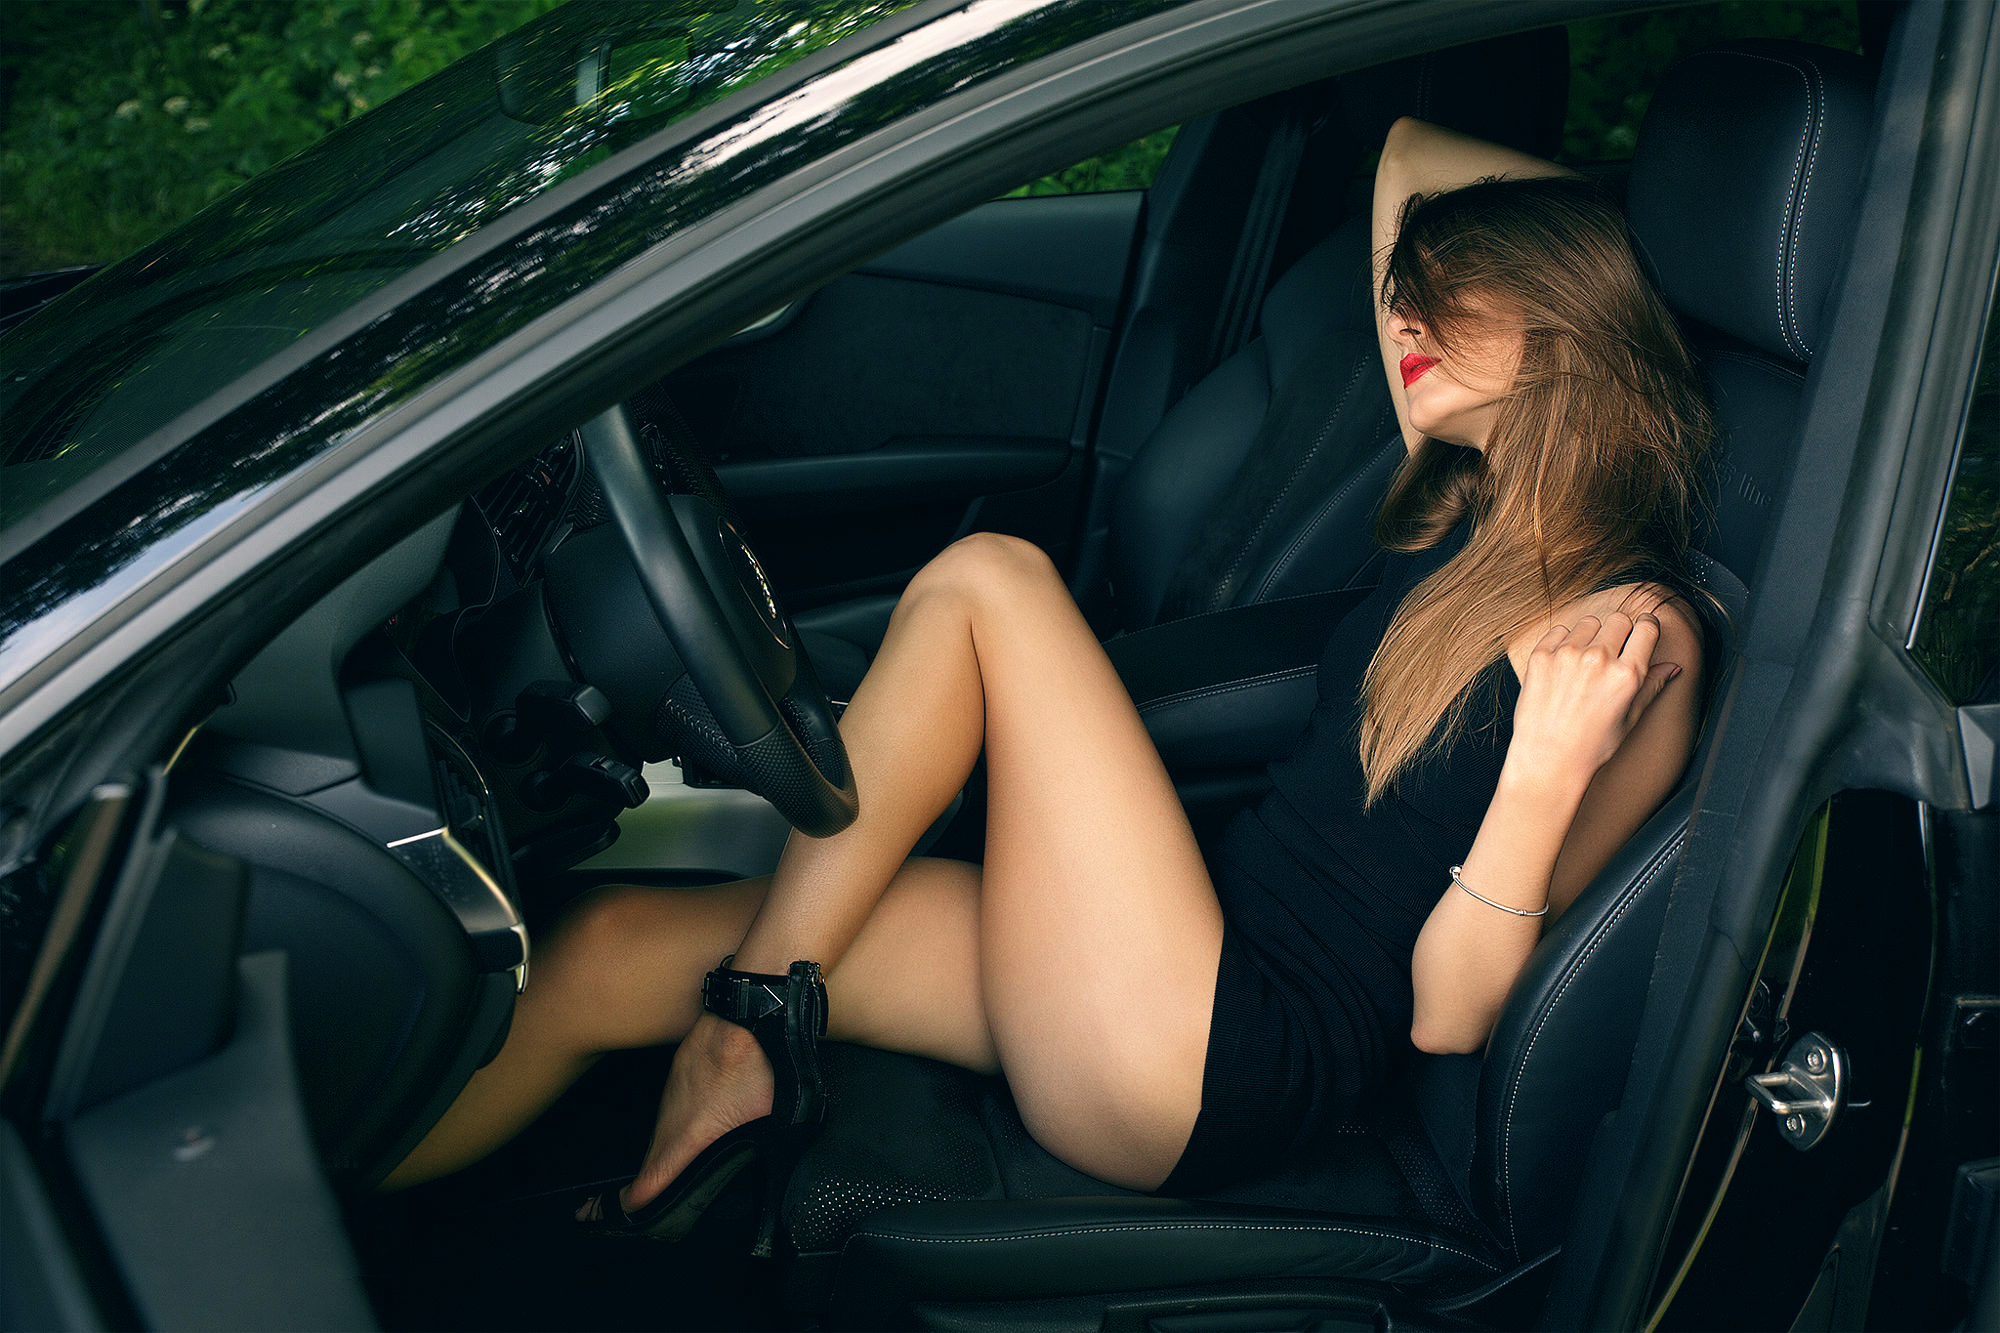 Hot Girls Fast Cars